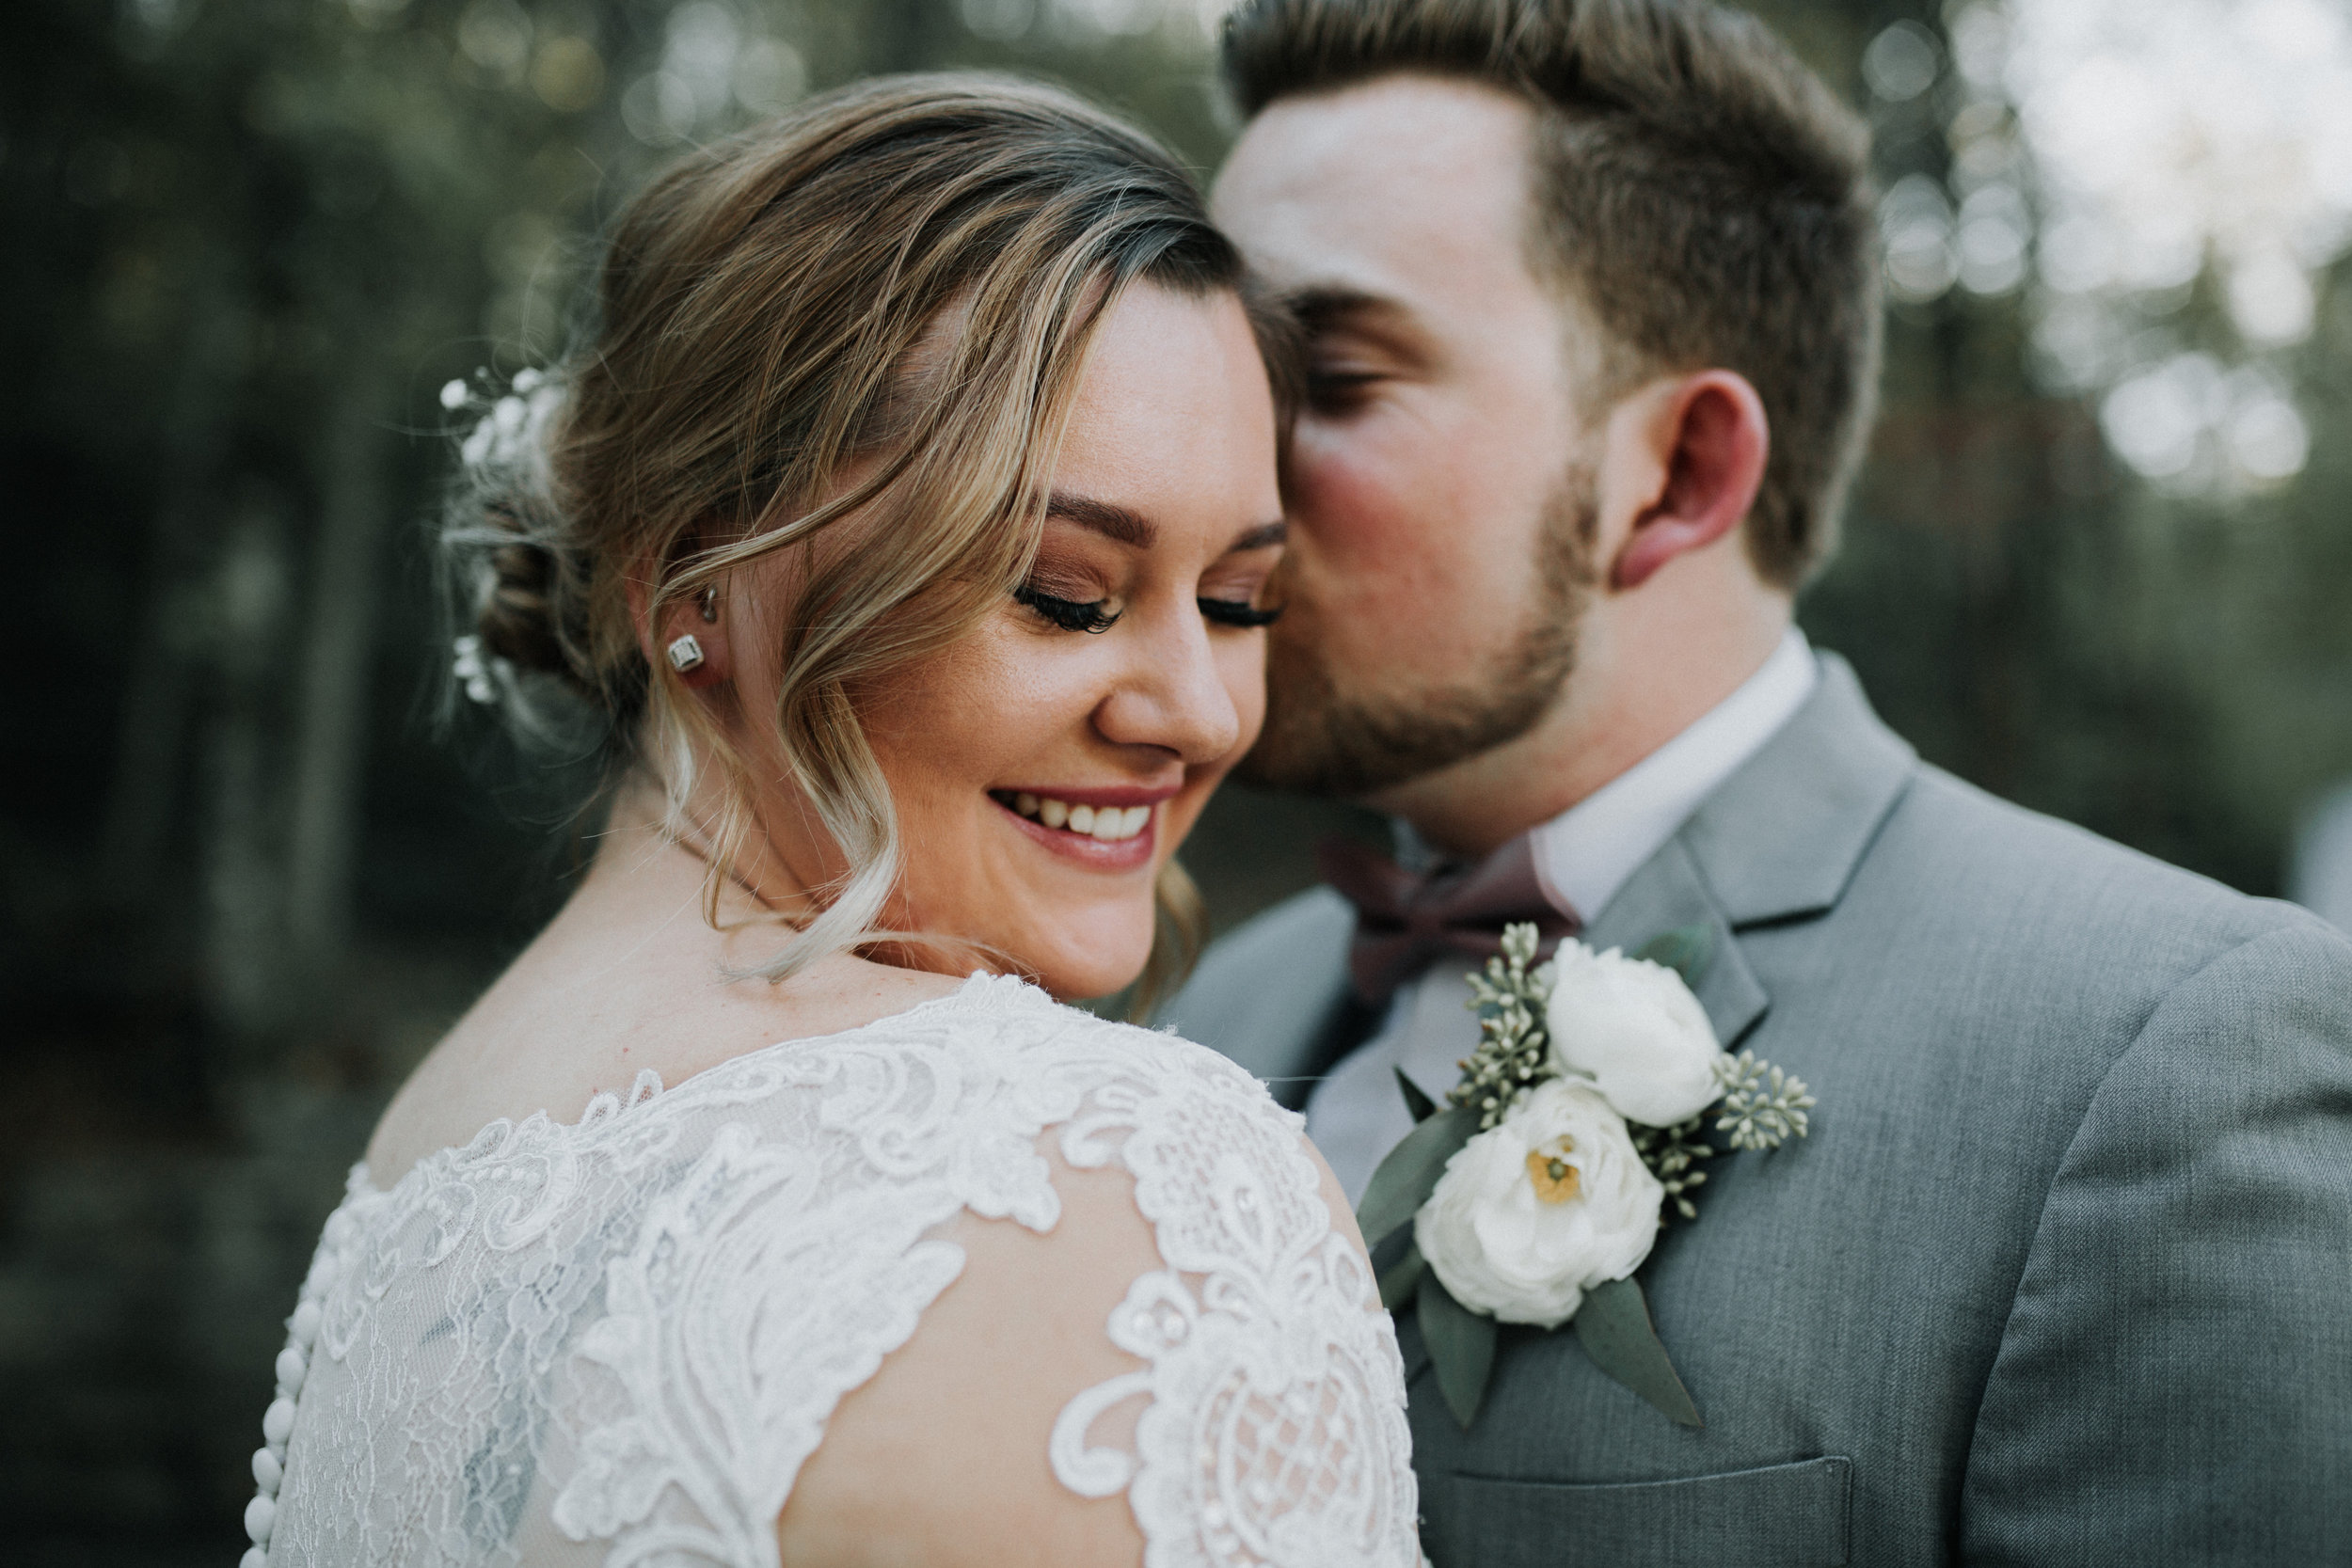 Gorgeous Long Sleeve Wedding Dresses - Dara's Garden Knoxville East Tennessee Wedding — The Overwhelmed Bride Wedding Blog